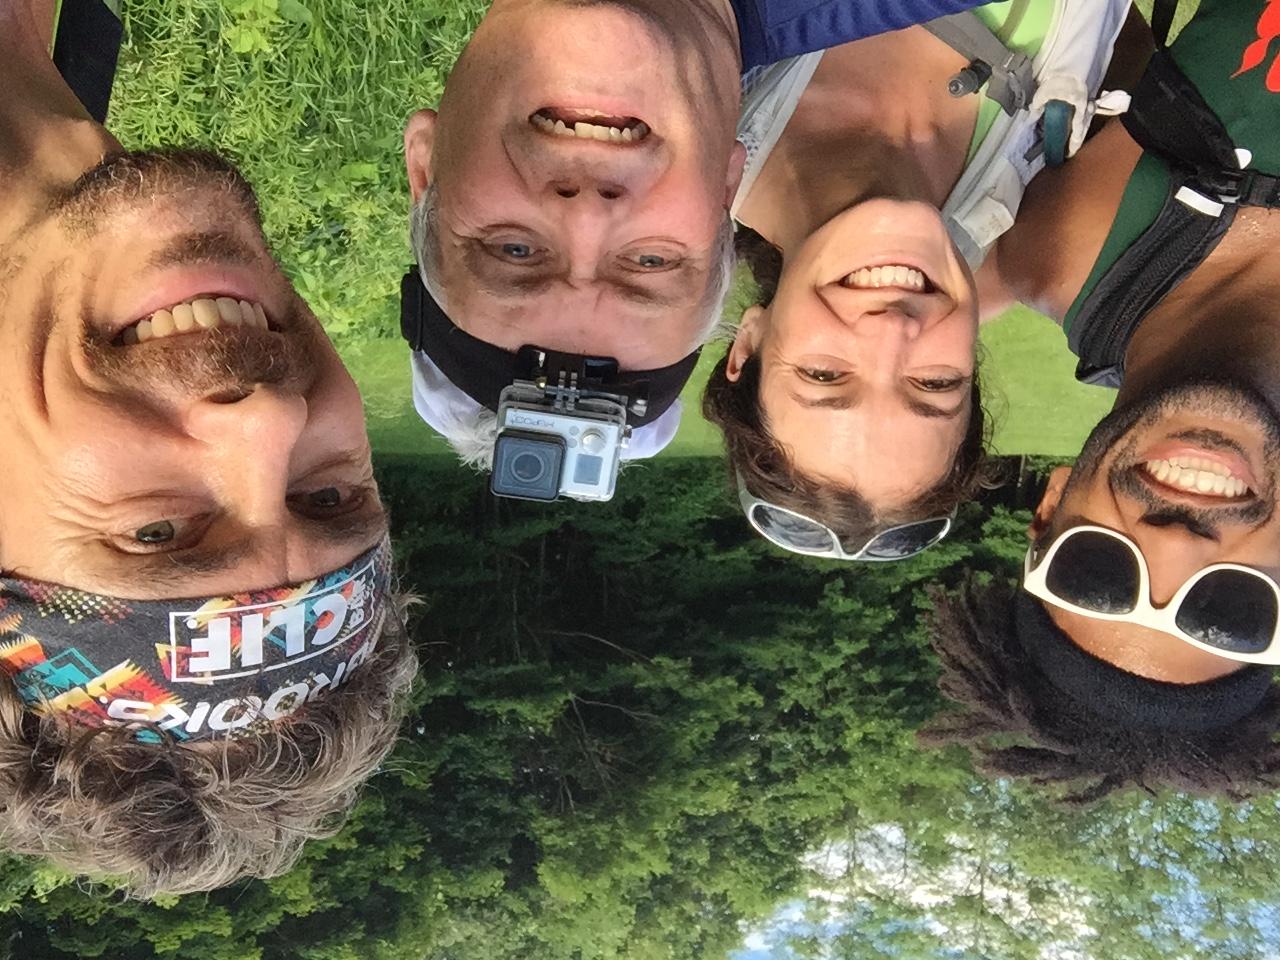 From Left: Knox Robinson, Kali Bird, Chris Cassone, Scott Jurek. Photo by Chris Cassone